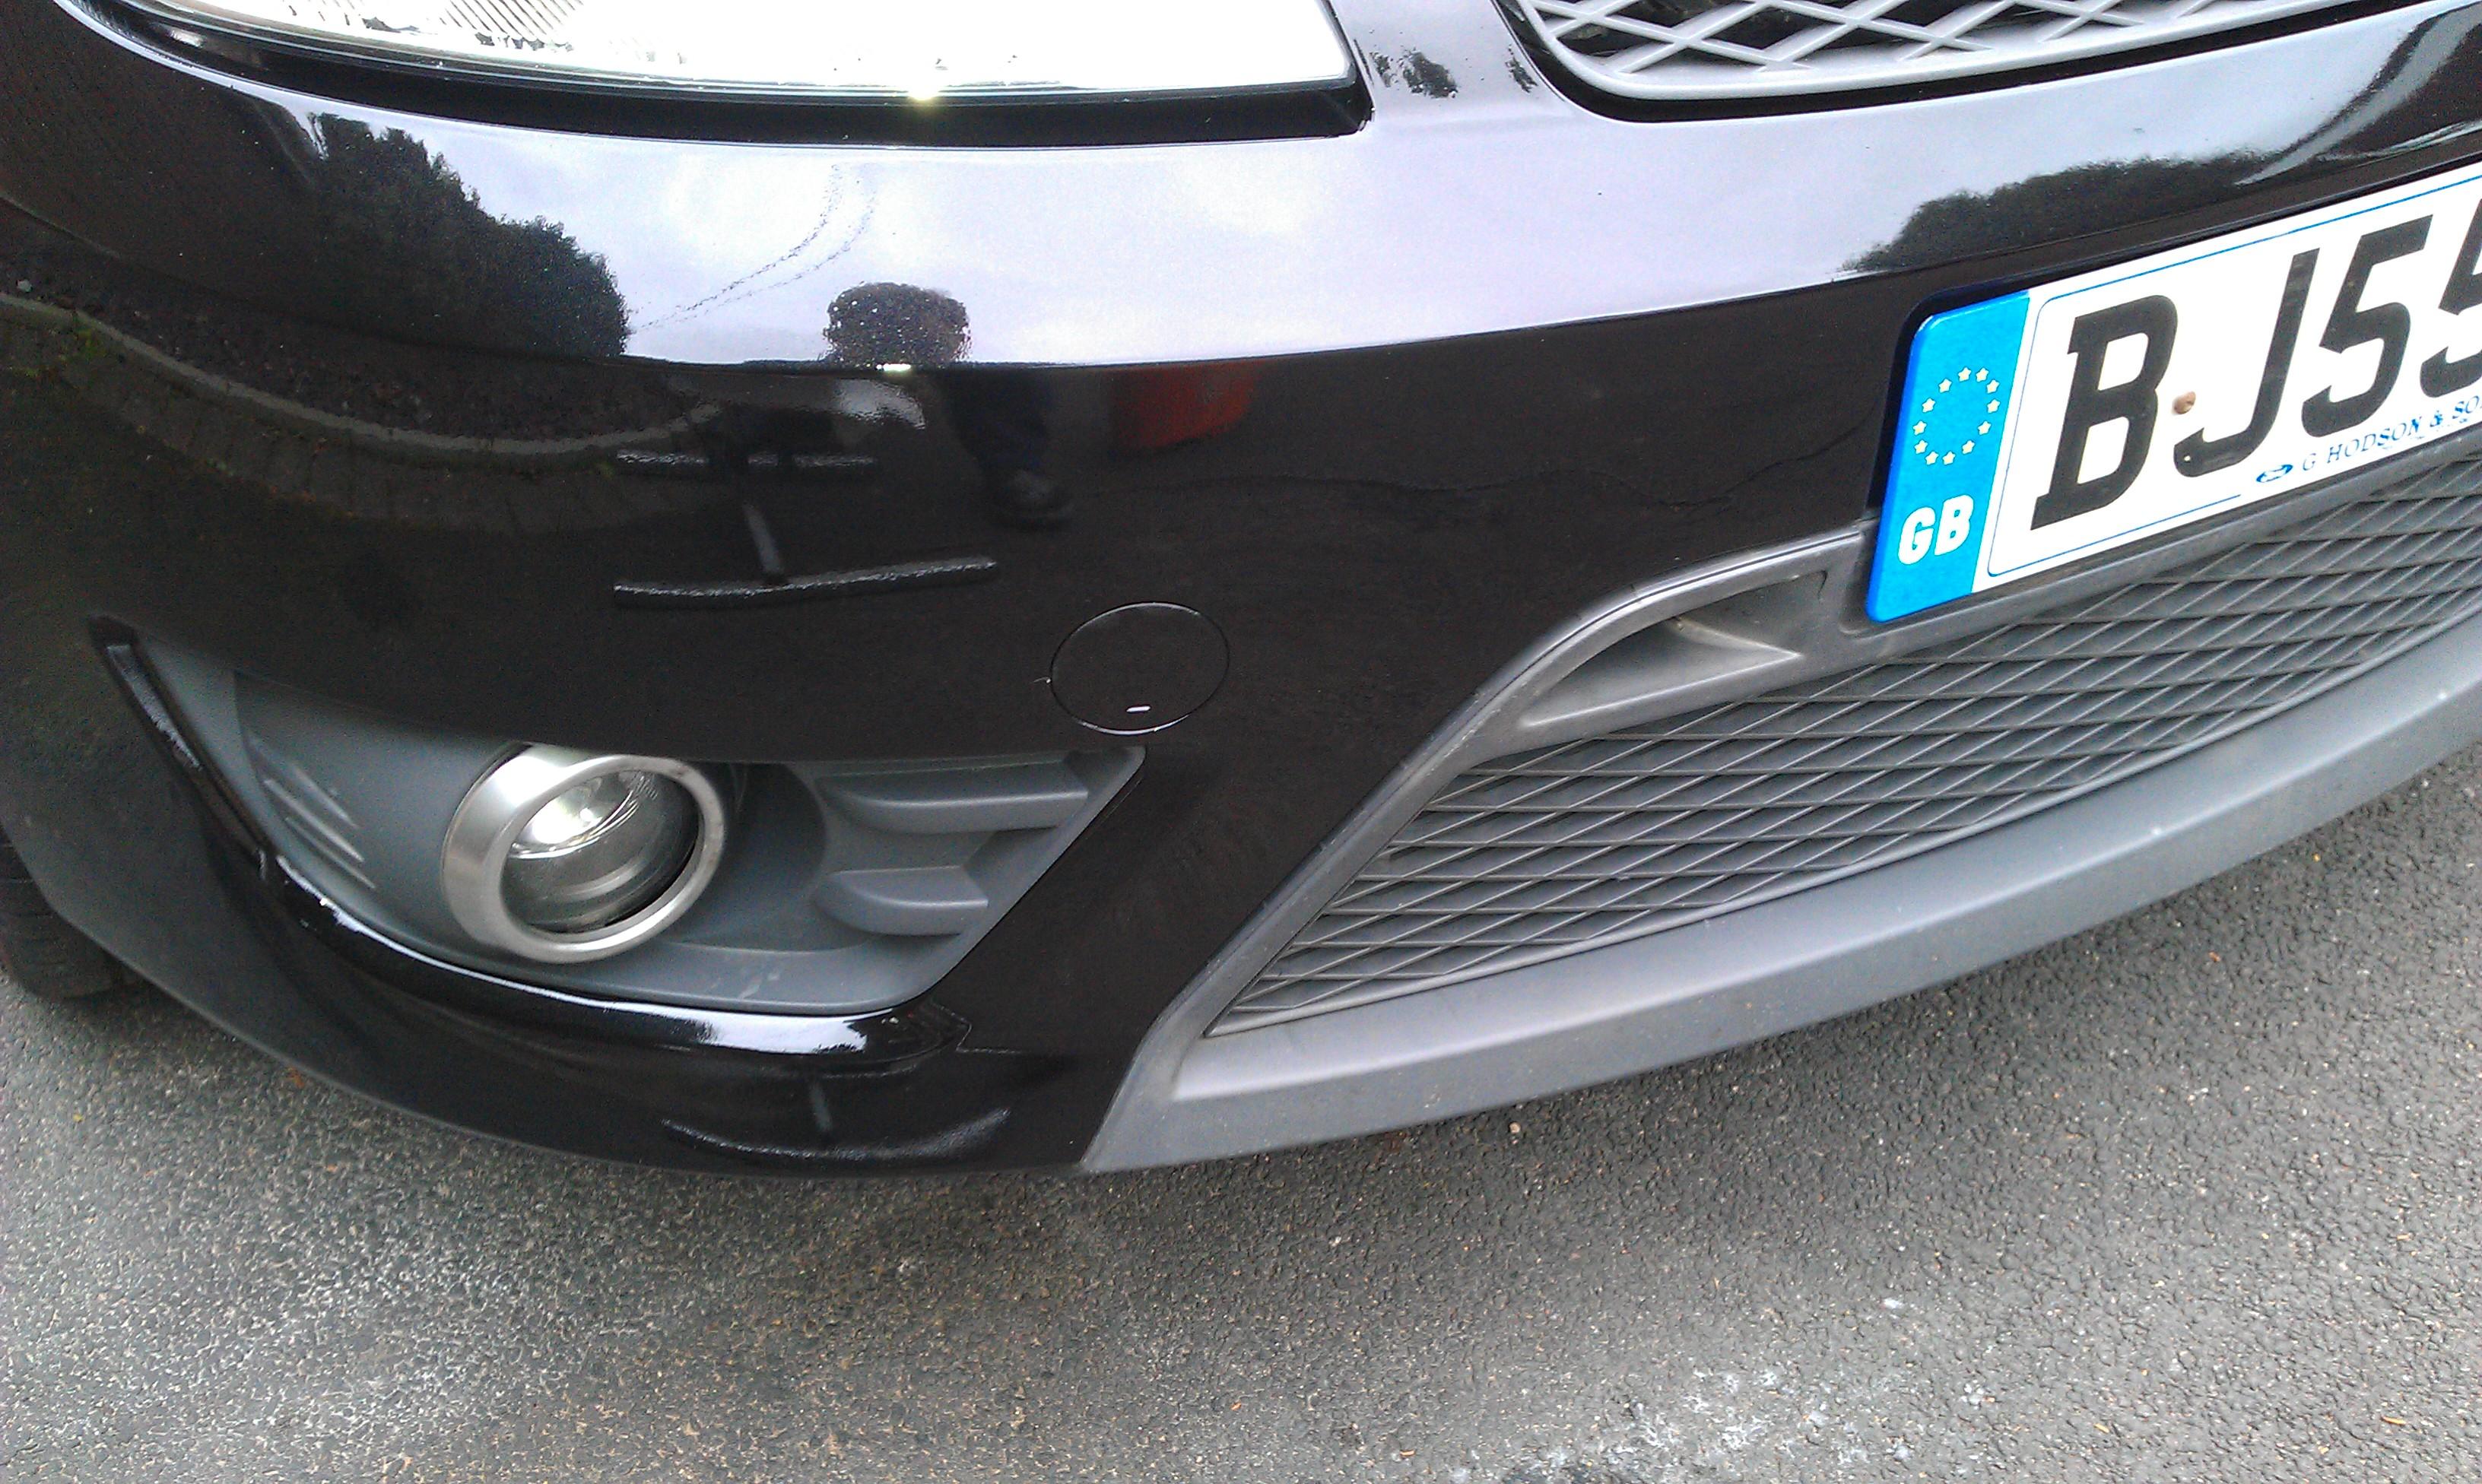 Plastic Welding Training - Repair Cracked Bumpers, Trim and Headlights